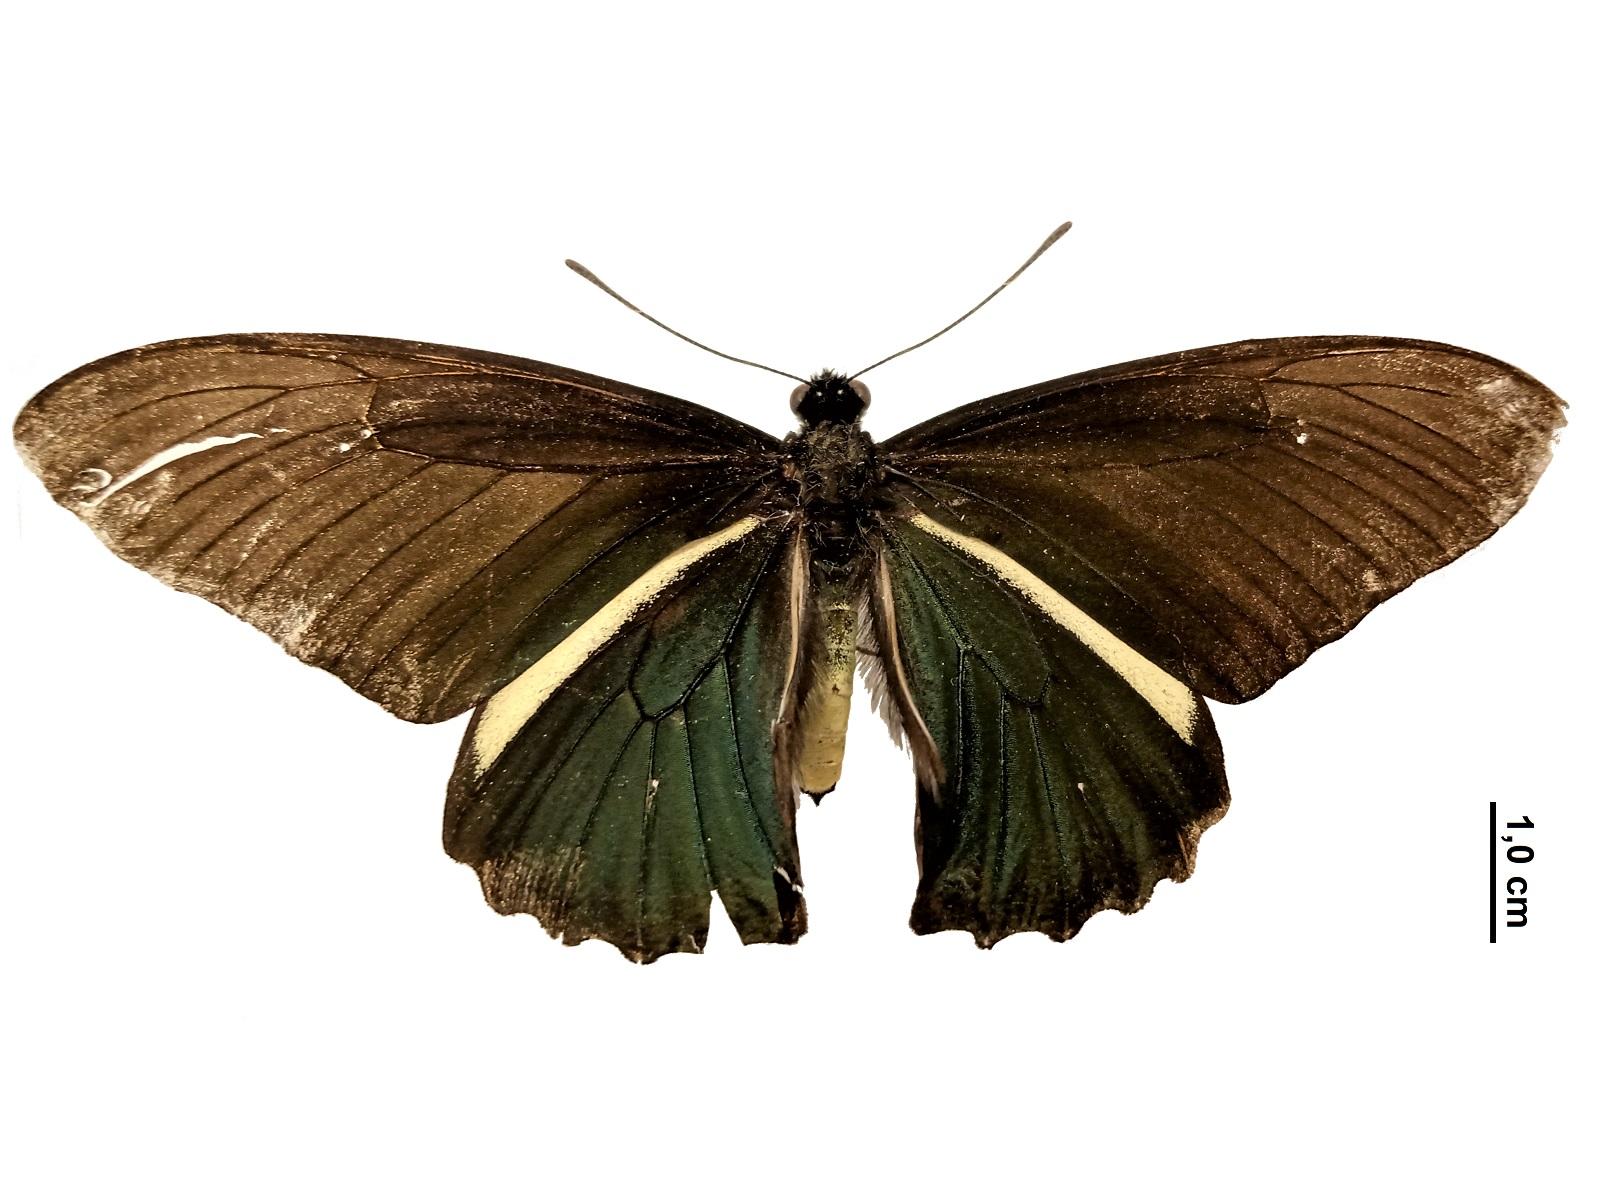 Battus crassus lepidus (Felder & Felder, 1861)